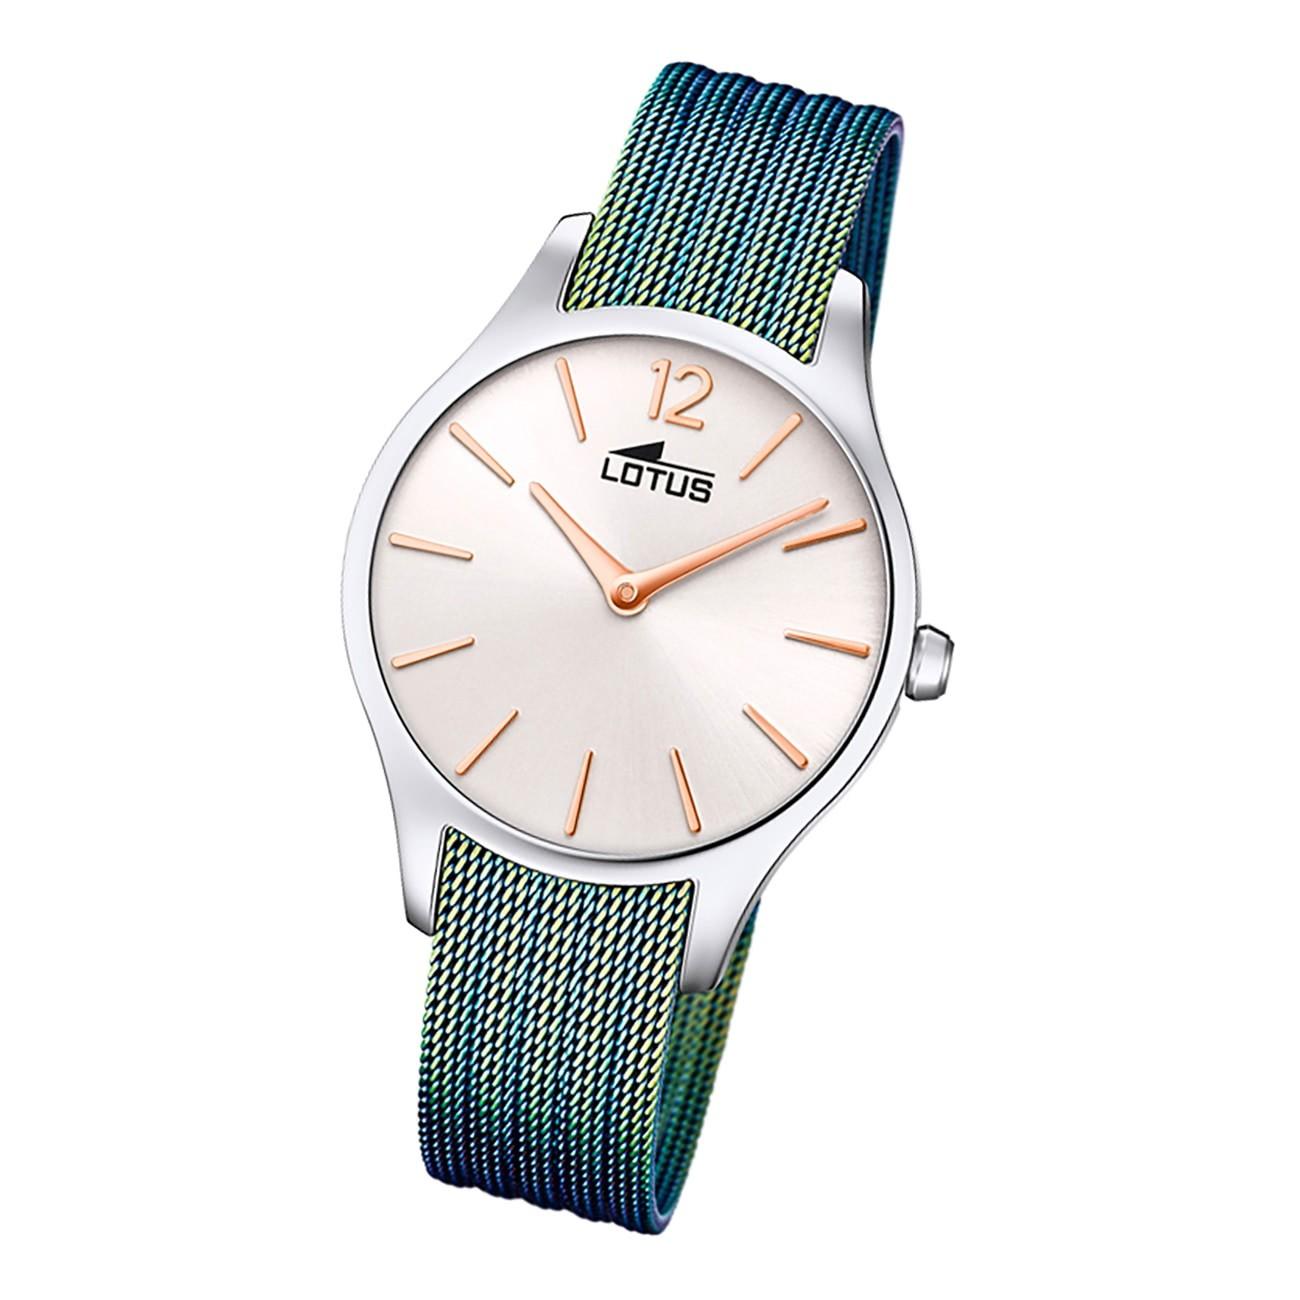 Lotus Damen Armbanduhr Bliss 18749/1 Analog Edelstahl blau grün UL18749/1